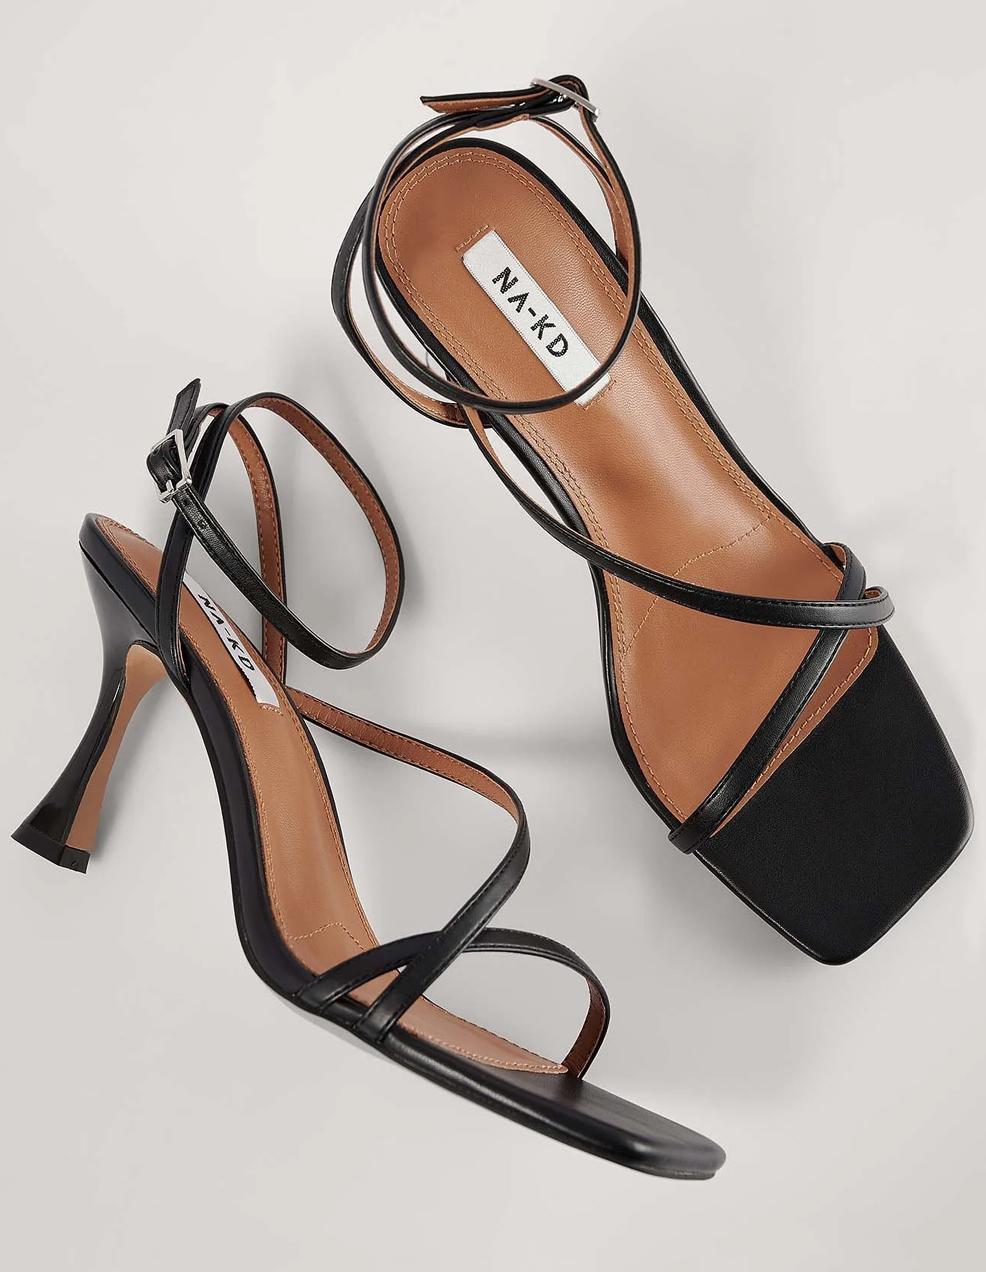 black strappy sandals 2021